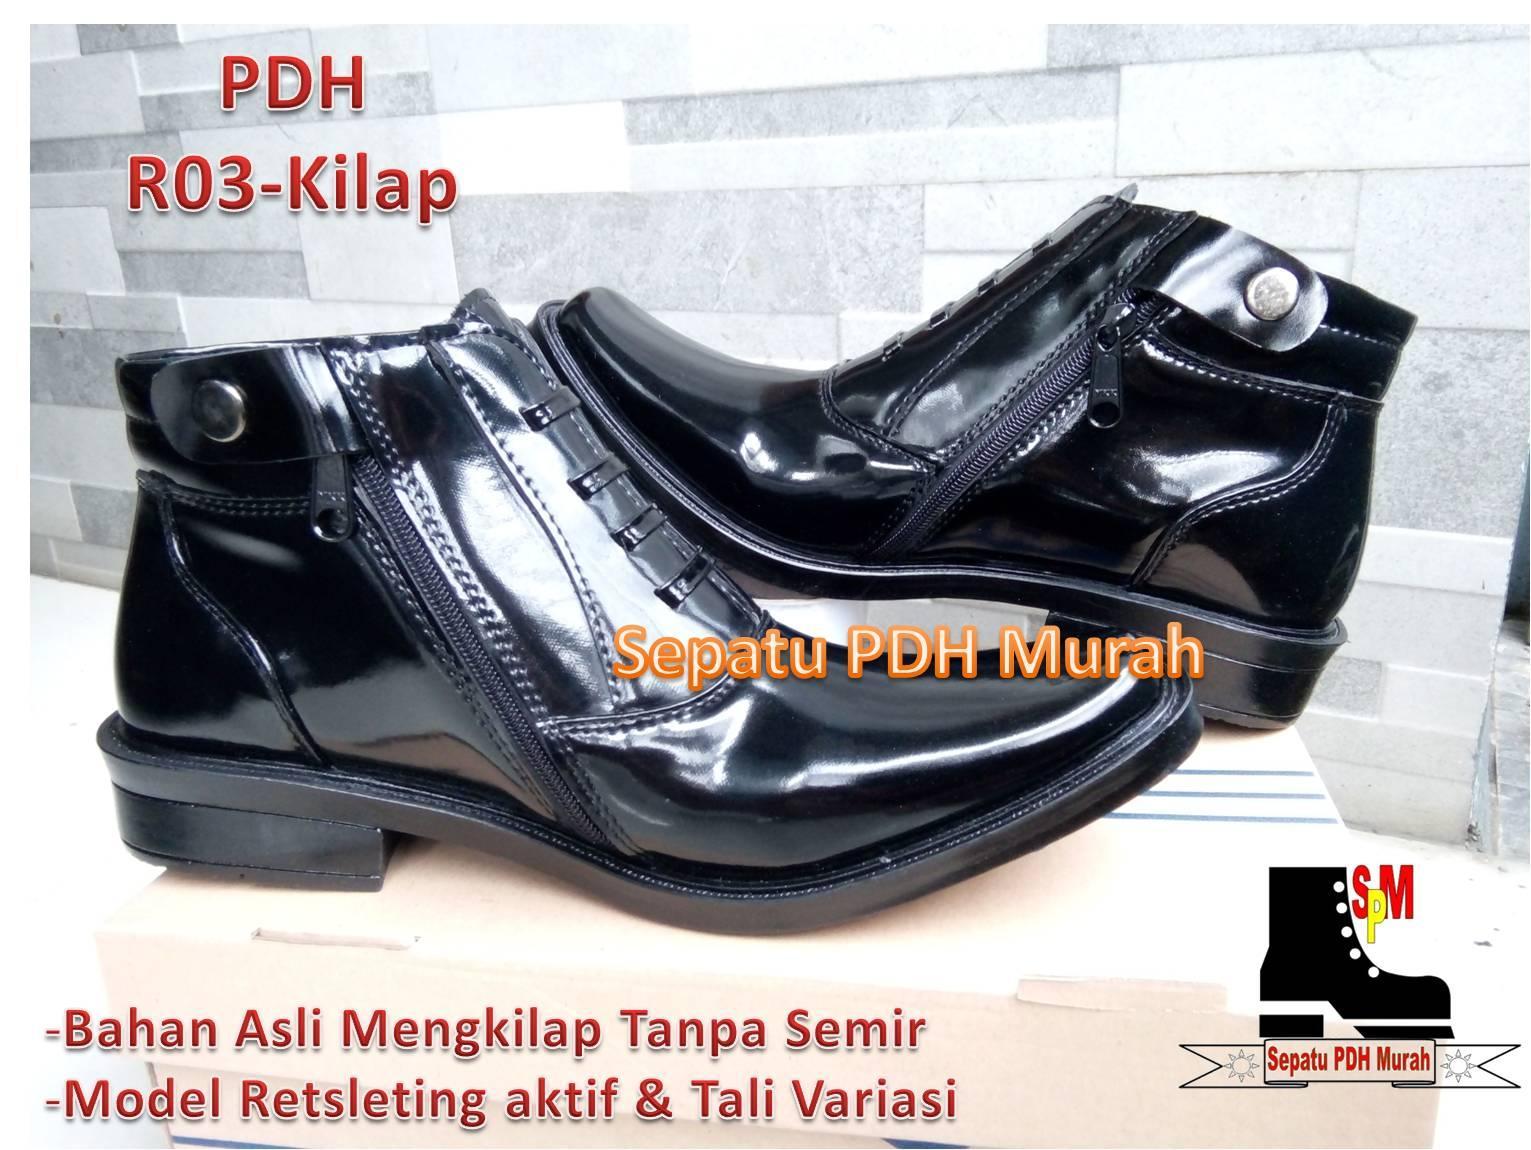 Sepatu PDH Mengkilap Asli, Model R-03  Standar Polri  Harga Promo